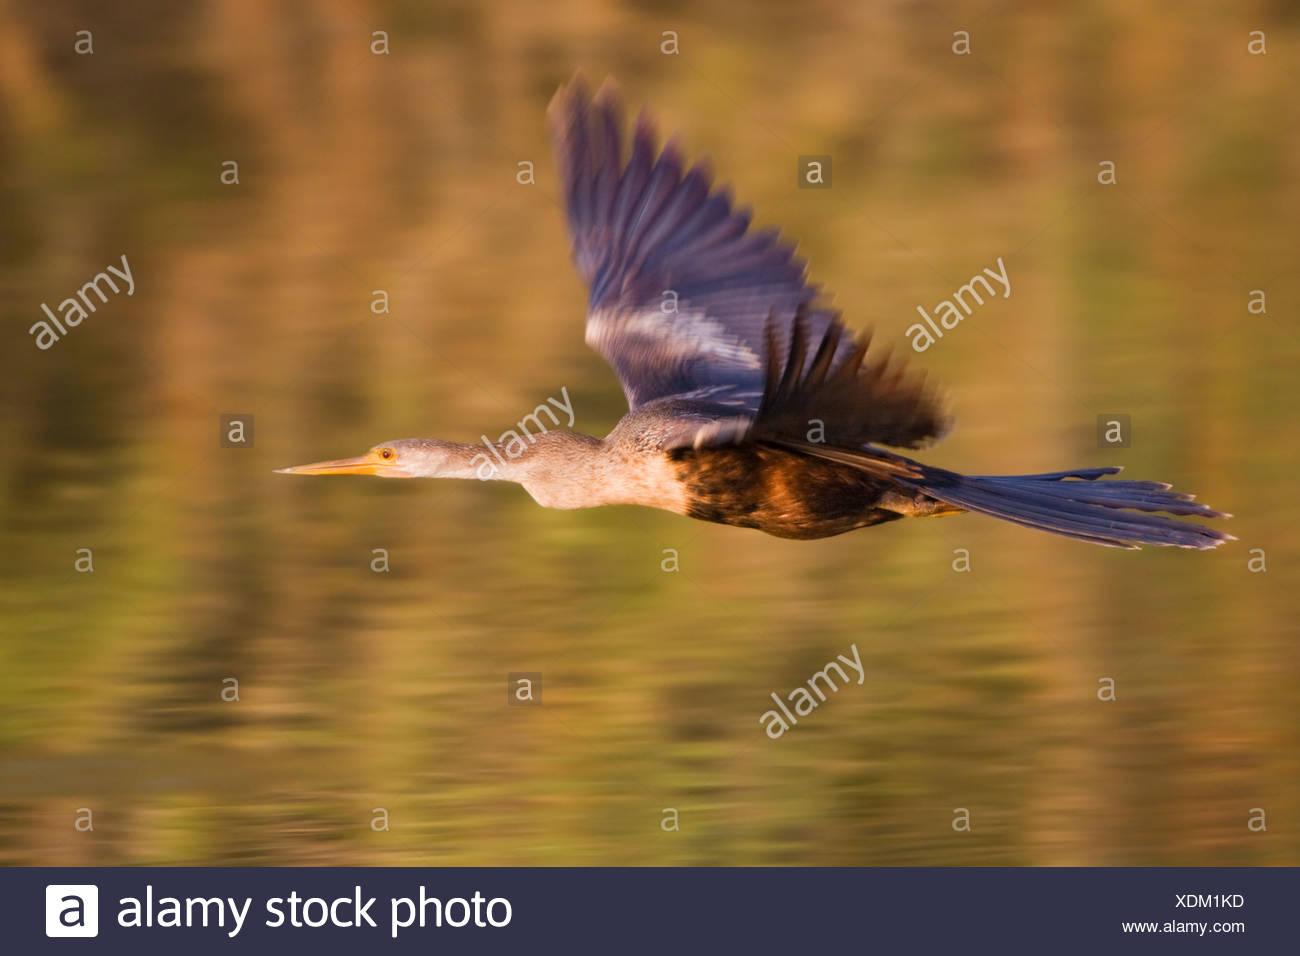 Anhinga (Anhinga anhinga) in mid-flight at Estero Llano Grande State Park in Texas - Stock Image